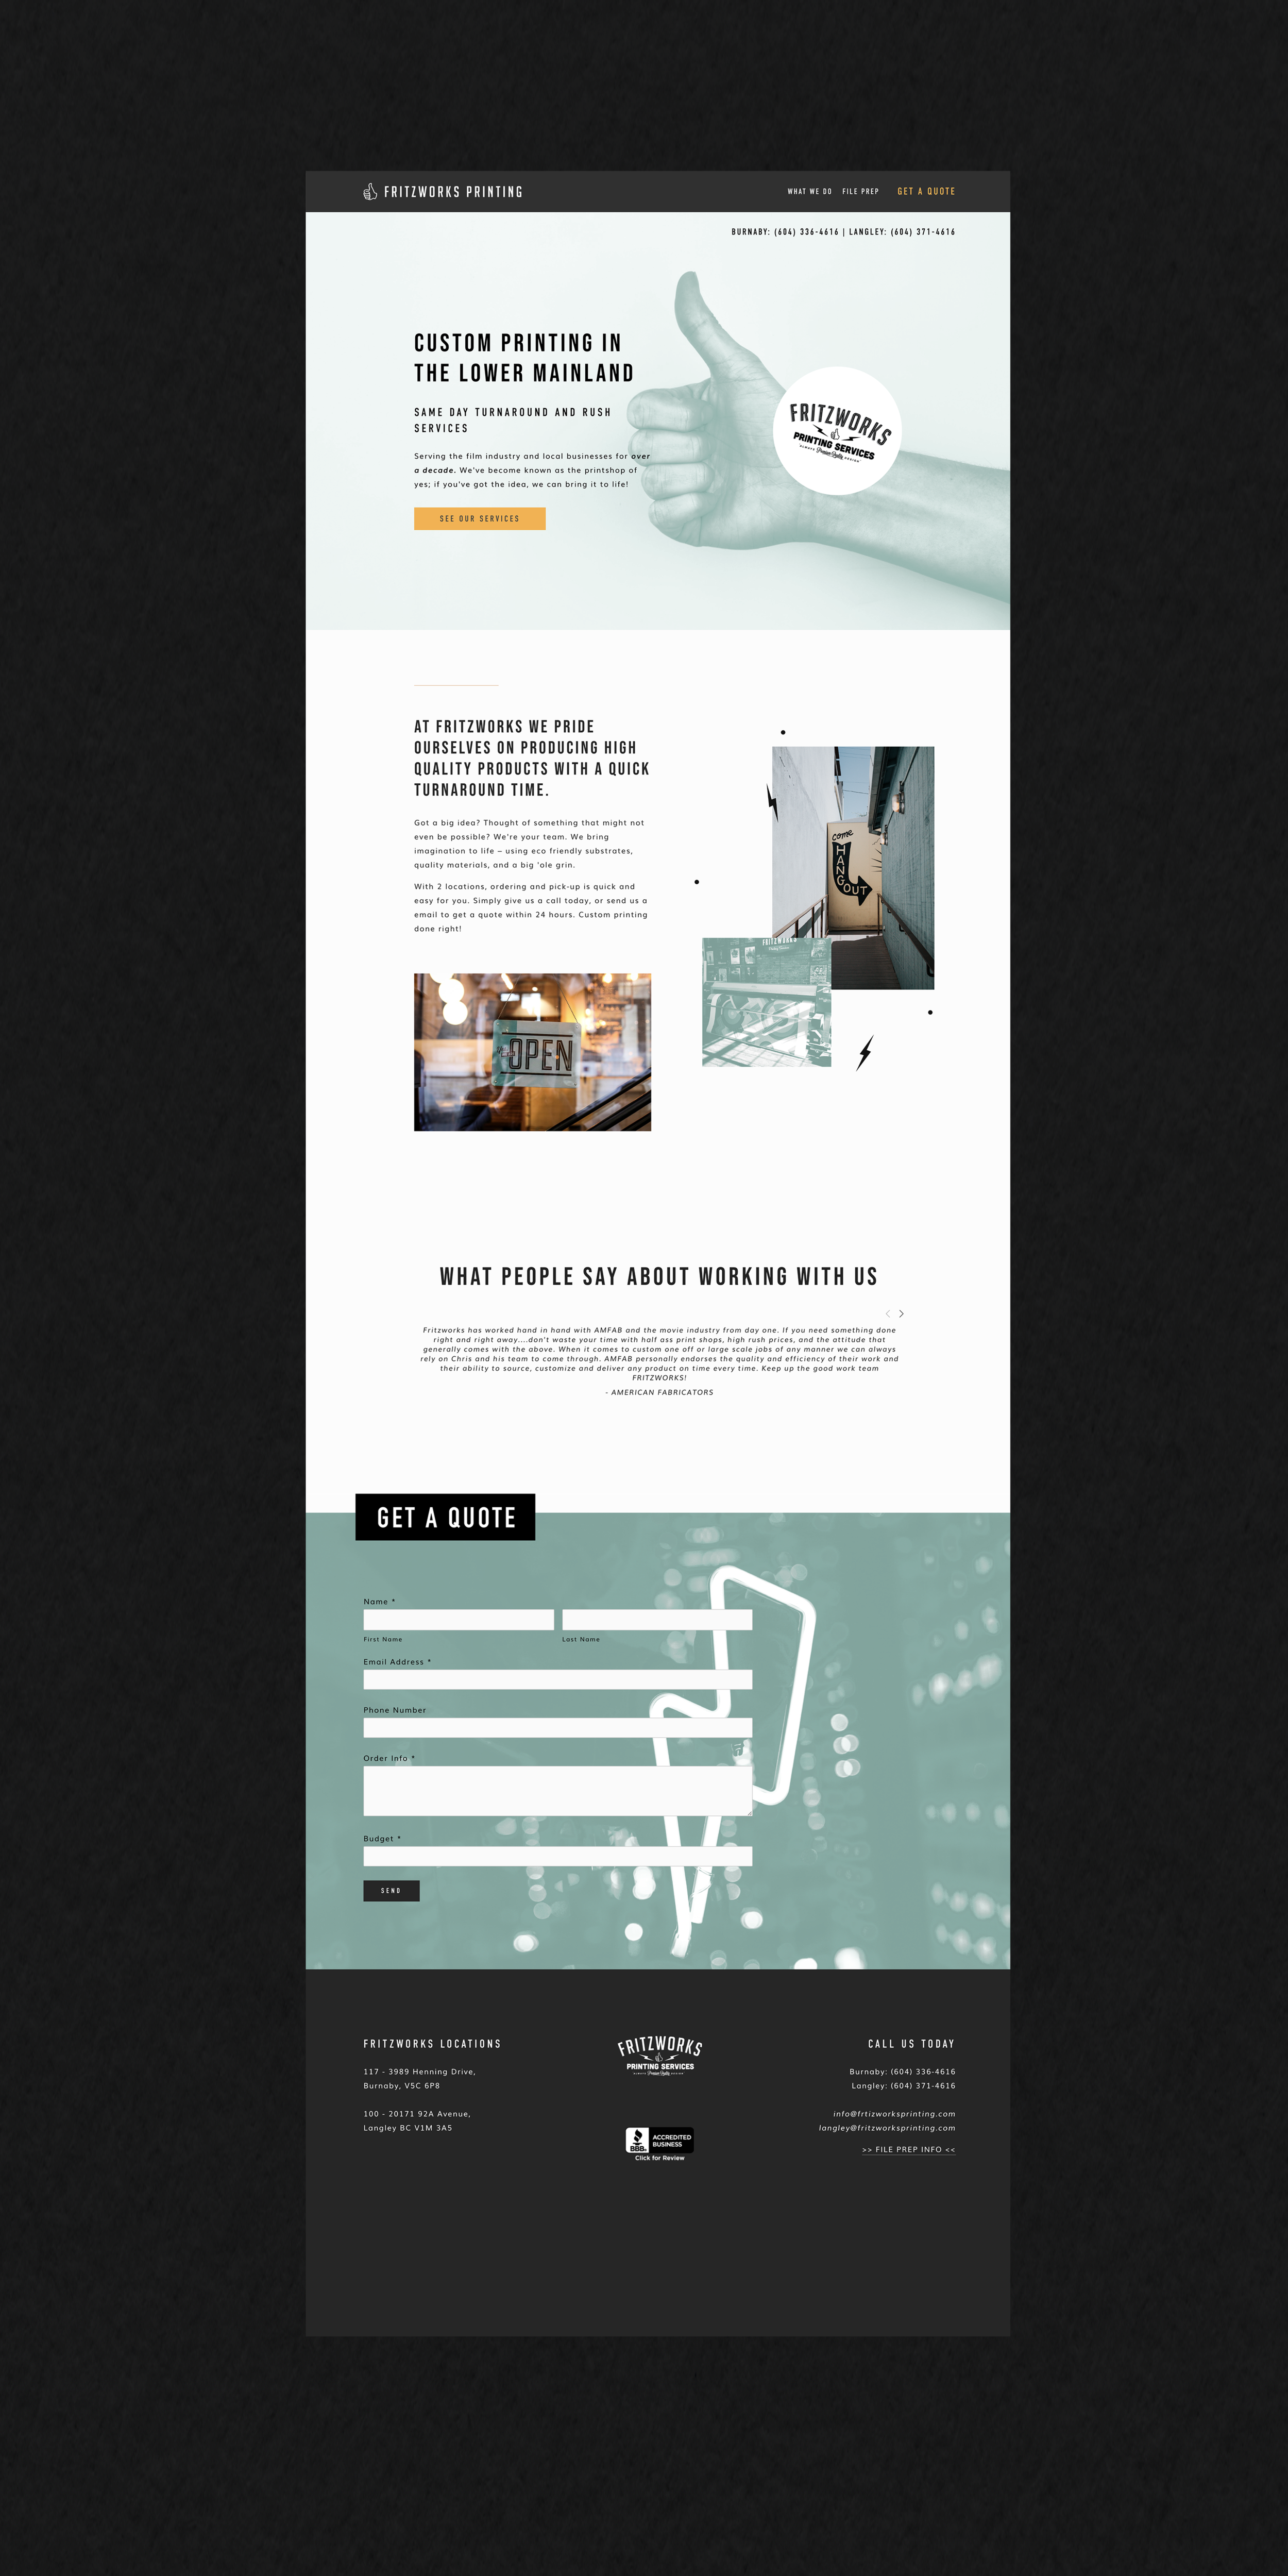 Fritzworks Printing homepage shown on a black background, designed by Salt Design Co.